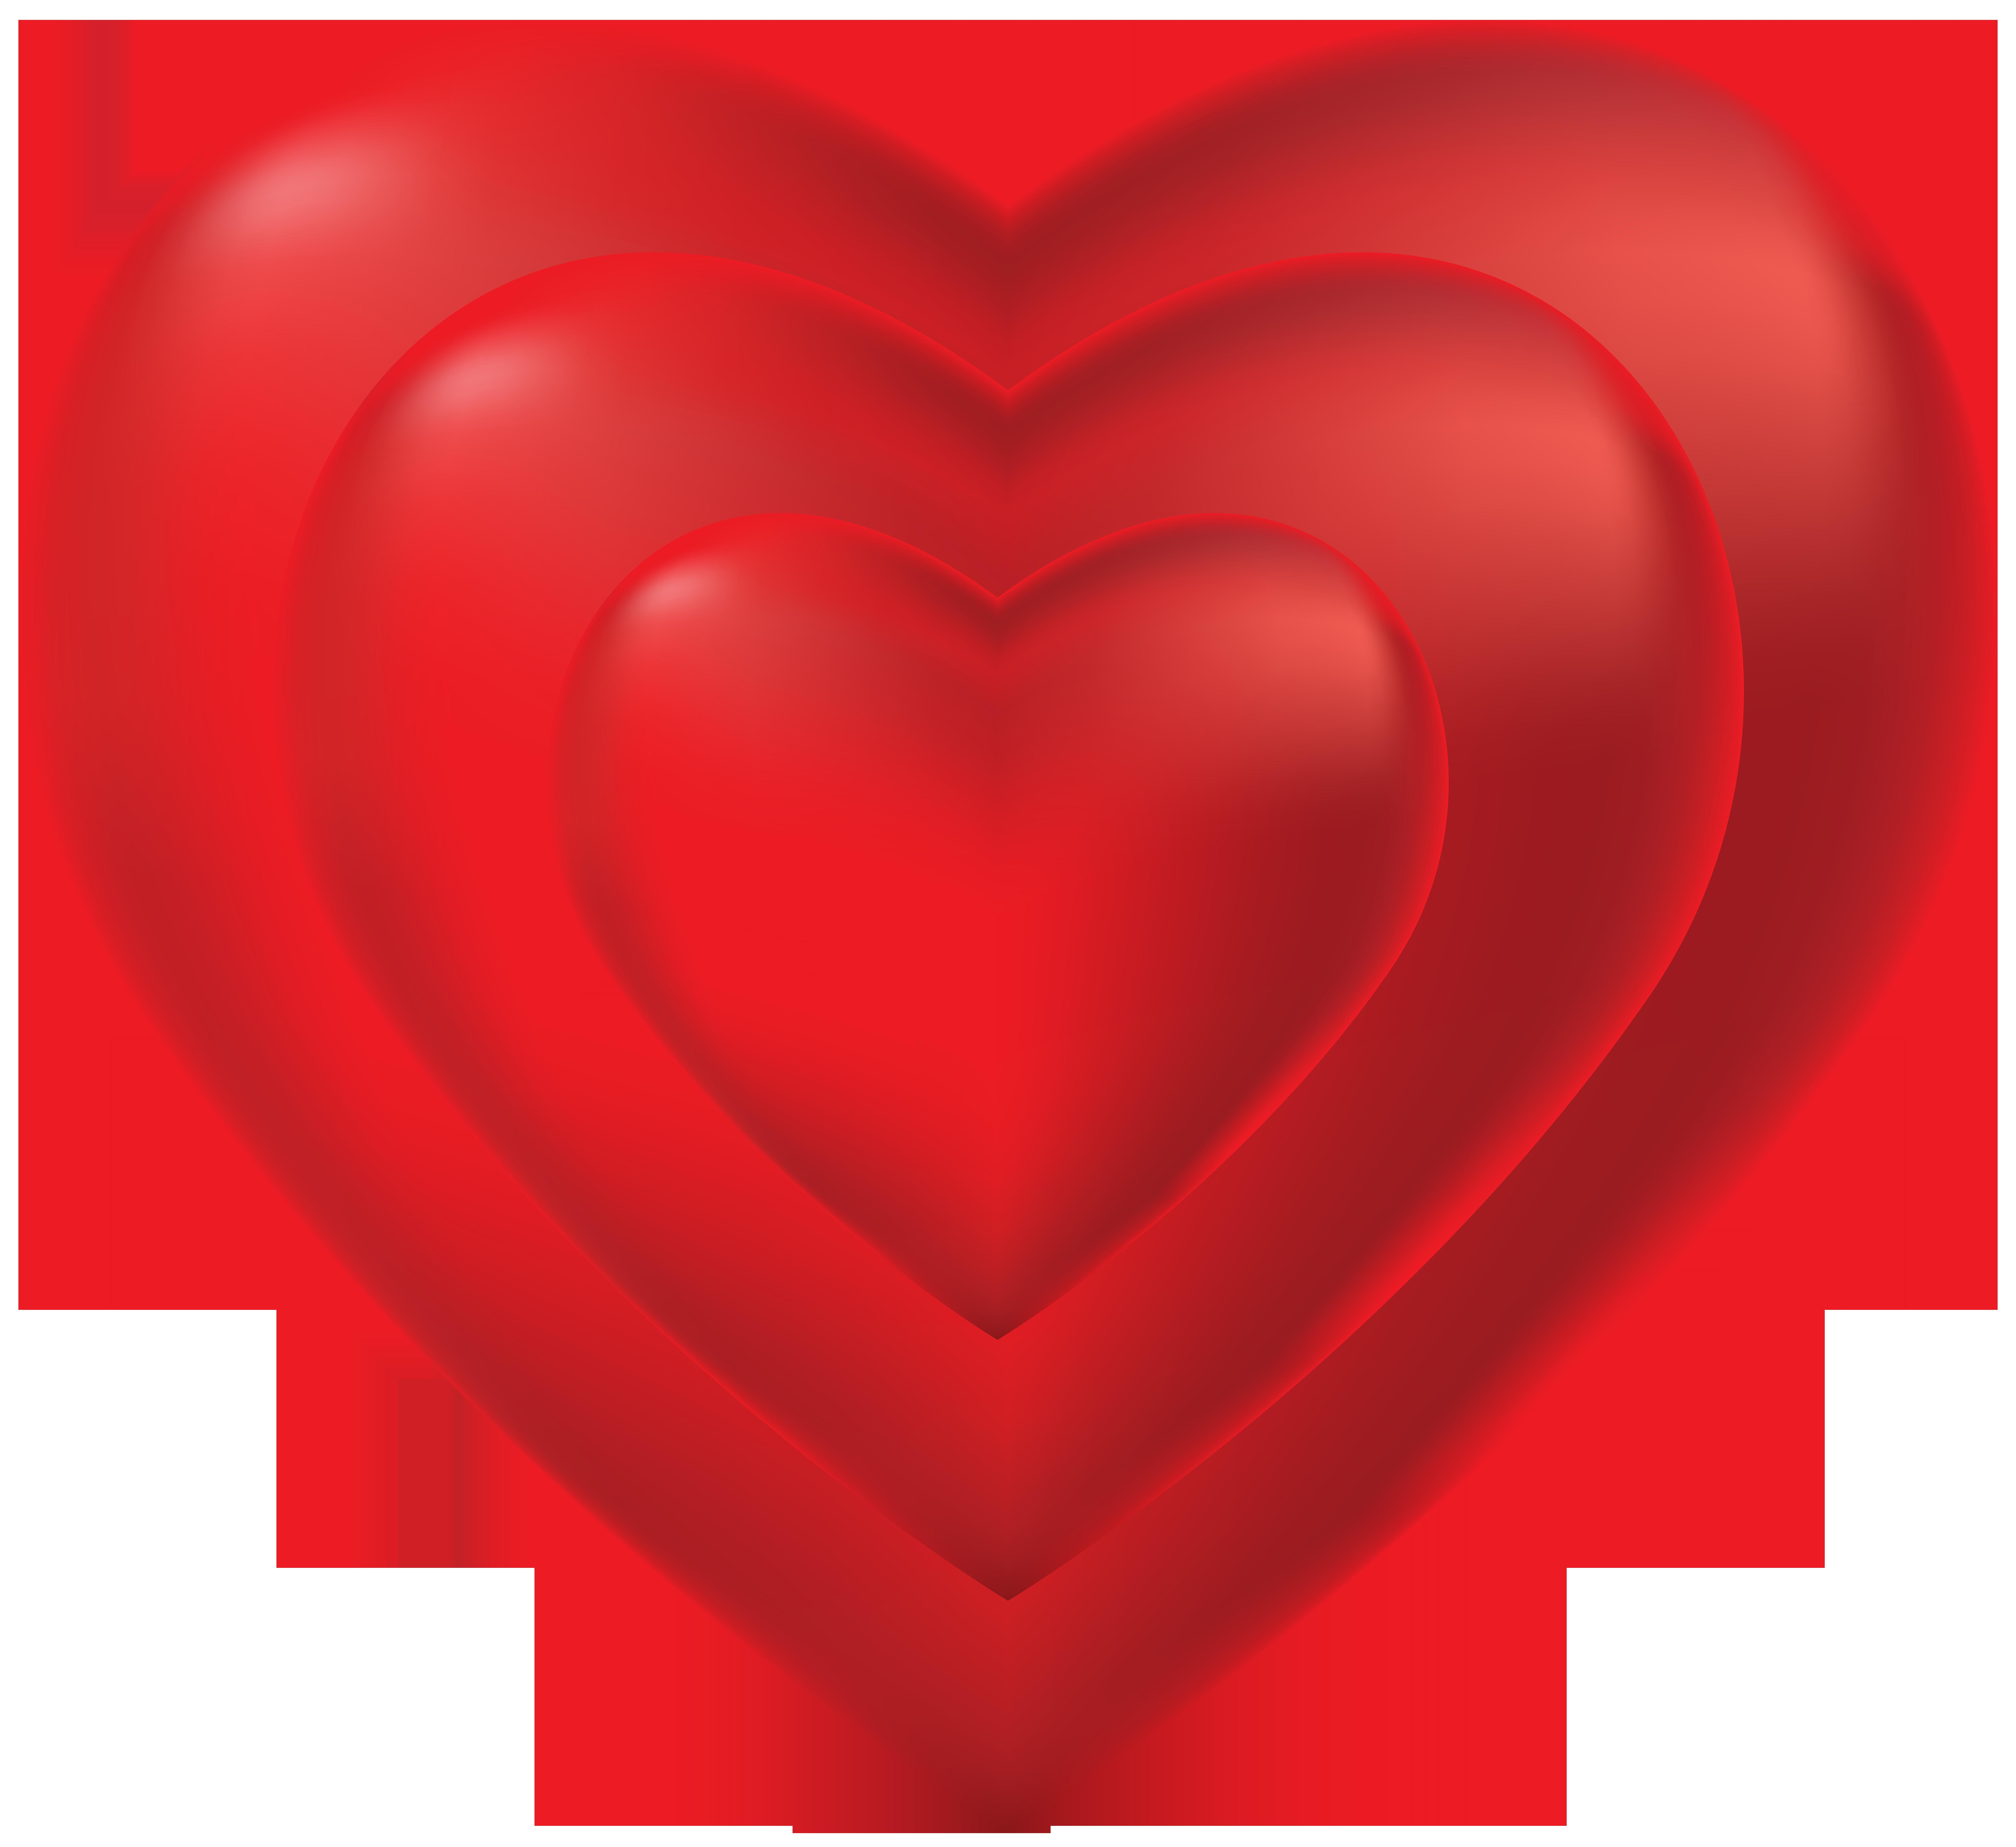 8000x7331 Heart Transparent Png Clip Artu200b Gallery Yopriceville